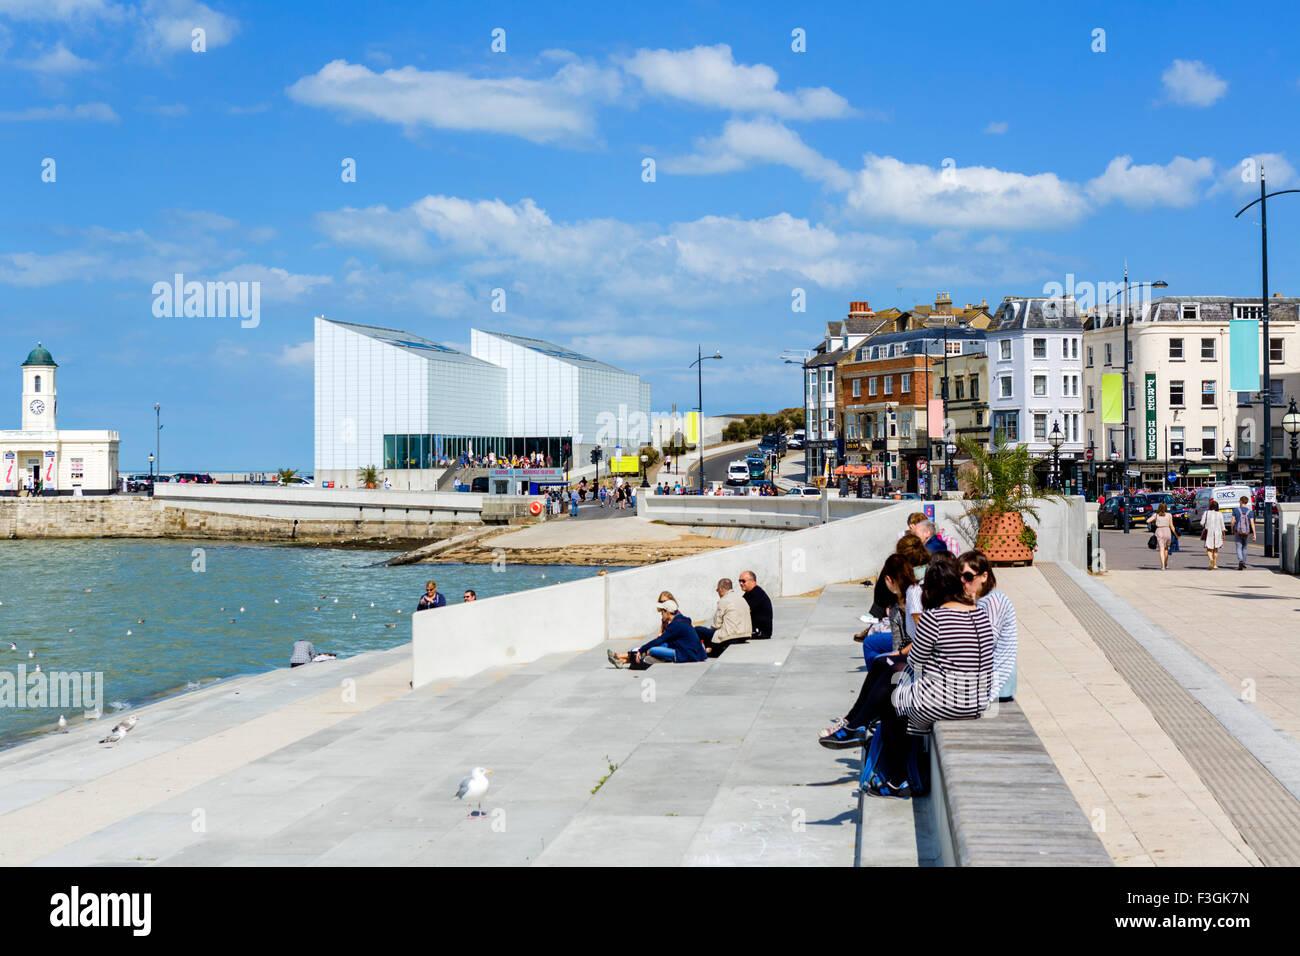 Die Promenade und Turner Contemporary Art Gallery in Margate, Kent, England, UK Stockbild